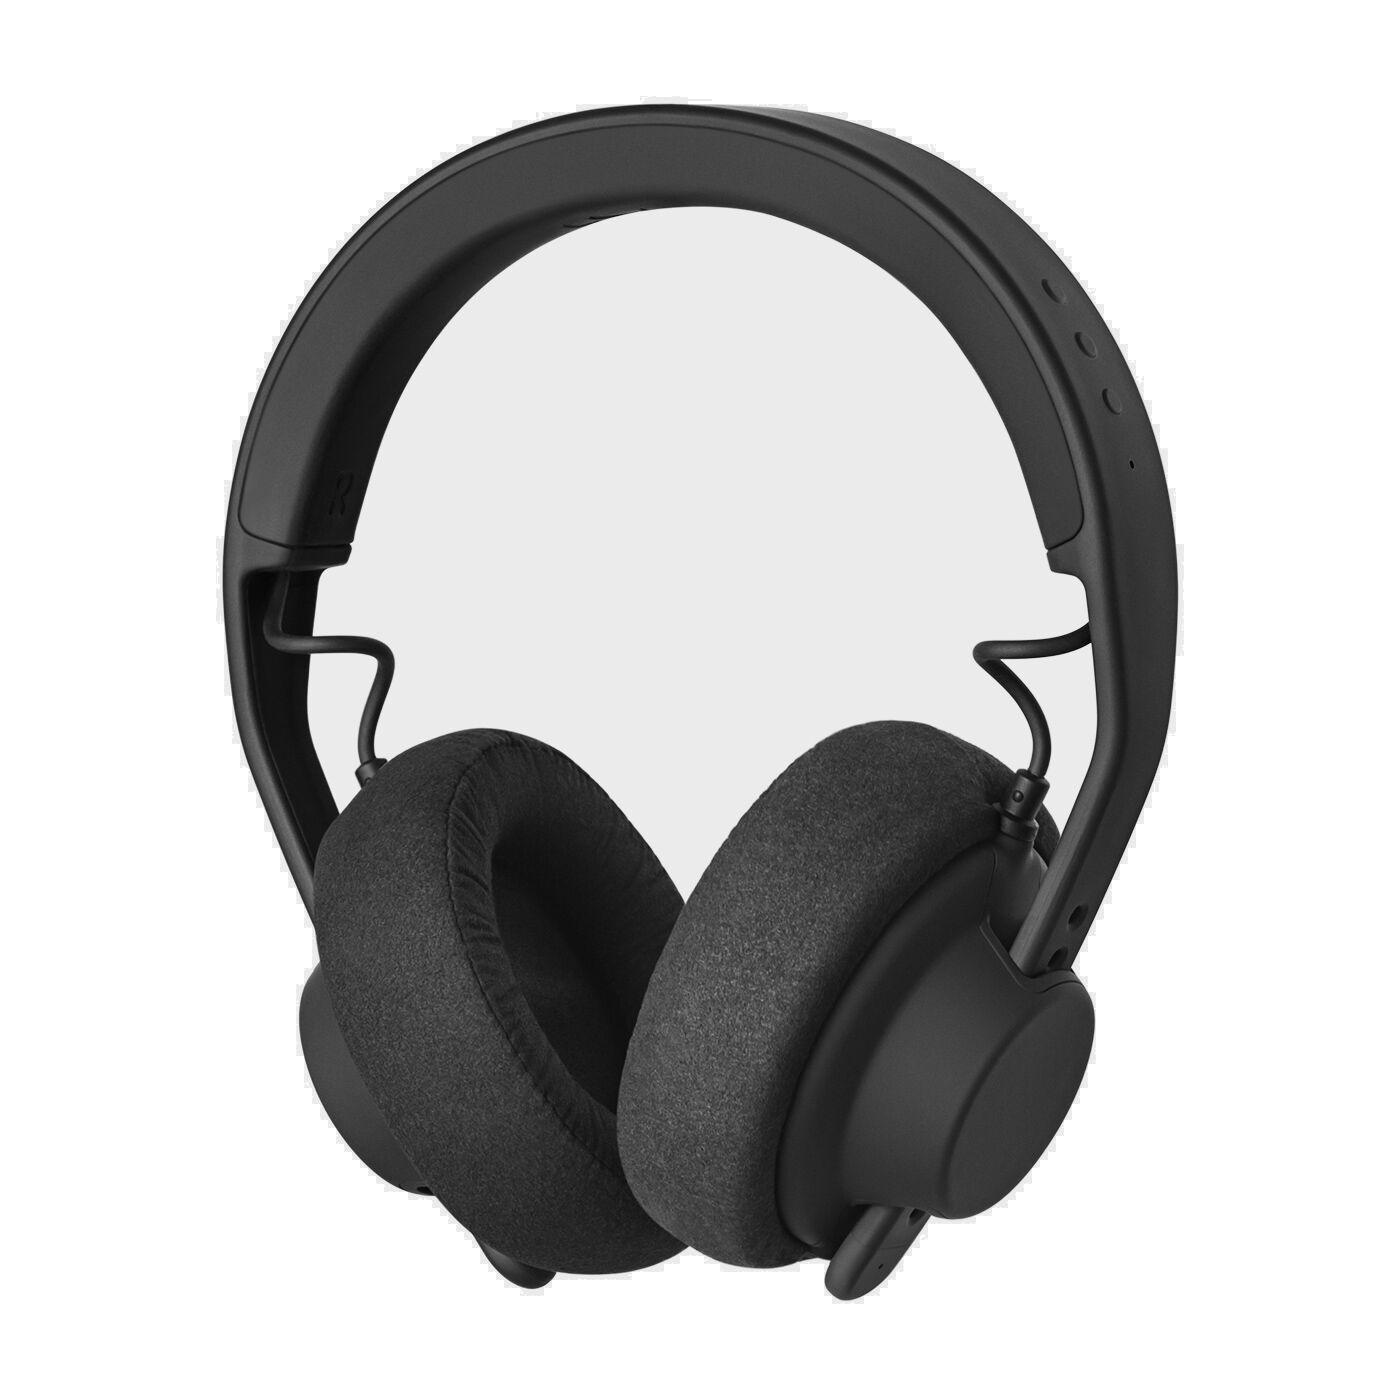 AIAIAI TMA-2 HD Wireless Modular Headphones